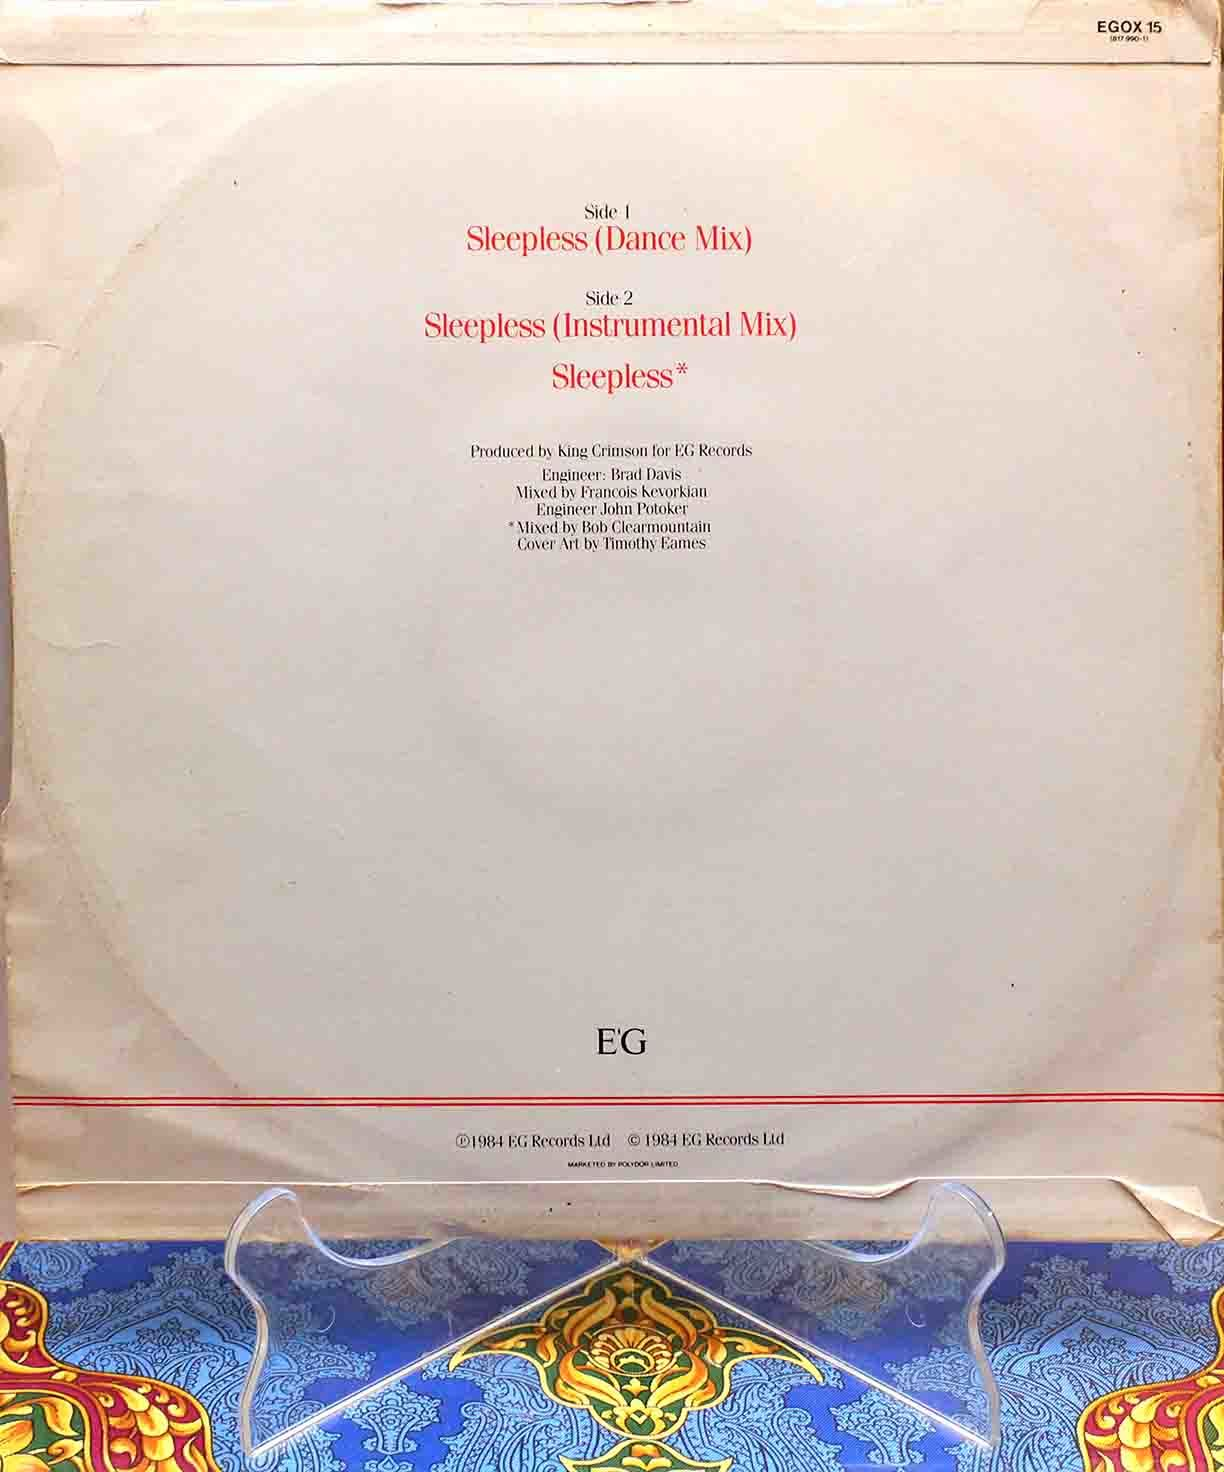 King Crimson Sleepless 02